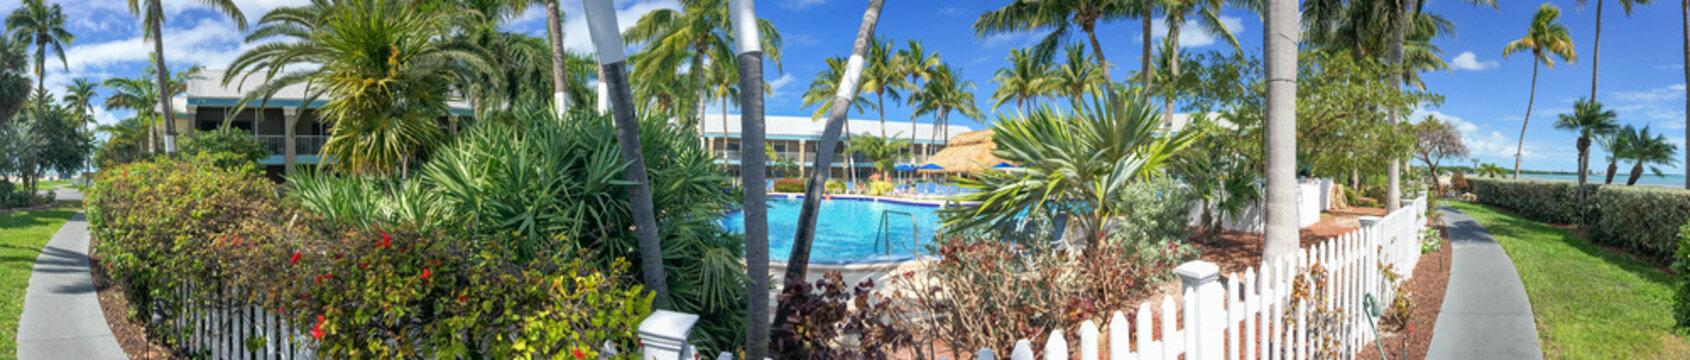 Beautiful coastline of Key West, panoramic view of Florida Keys - USA